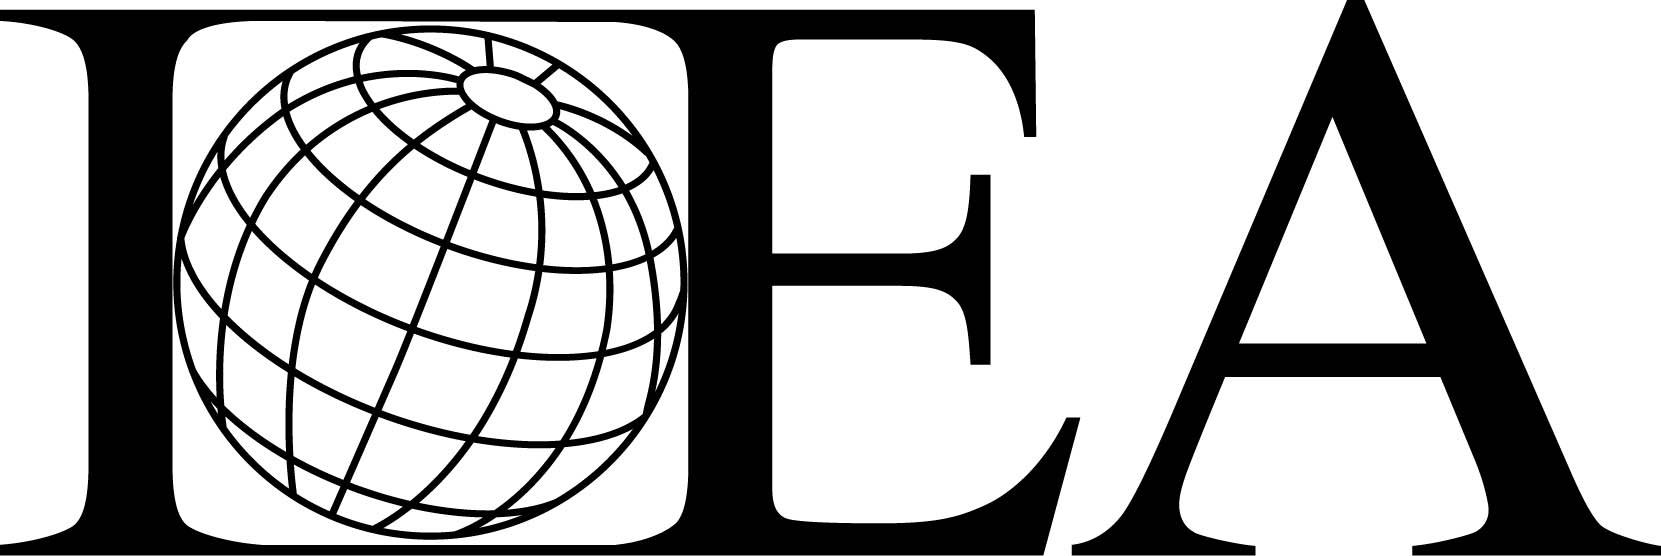 logo for International Epidemiological Association